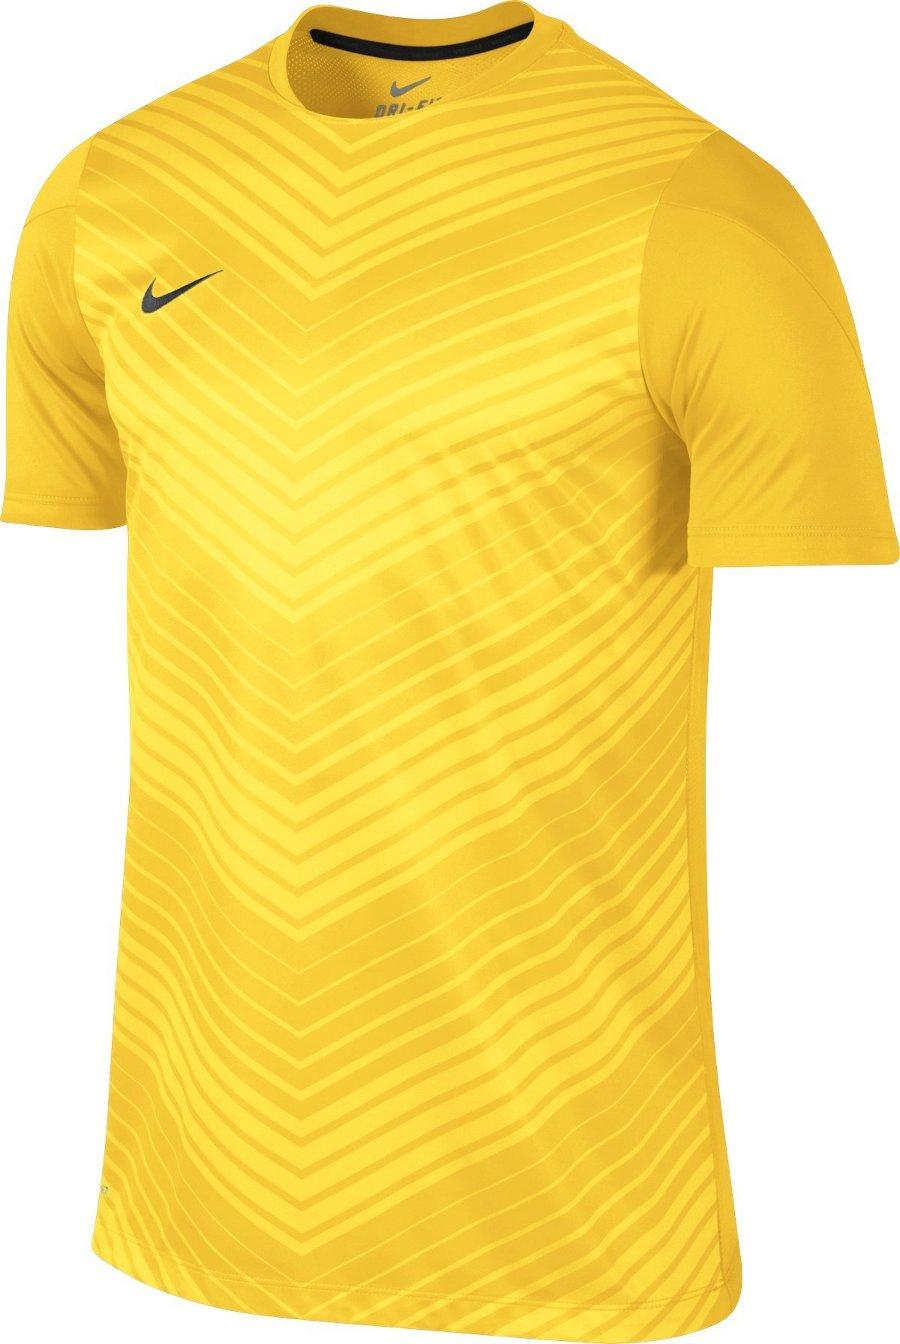 Nike Training Trikot Shirt Squad Pre Match Kurze armel Herren Dri-Fit